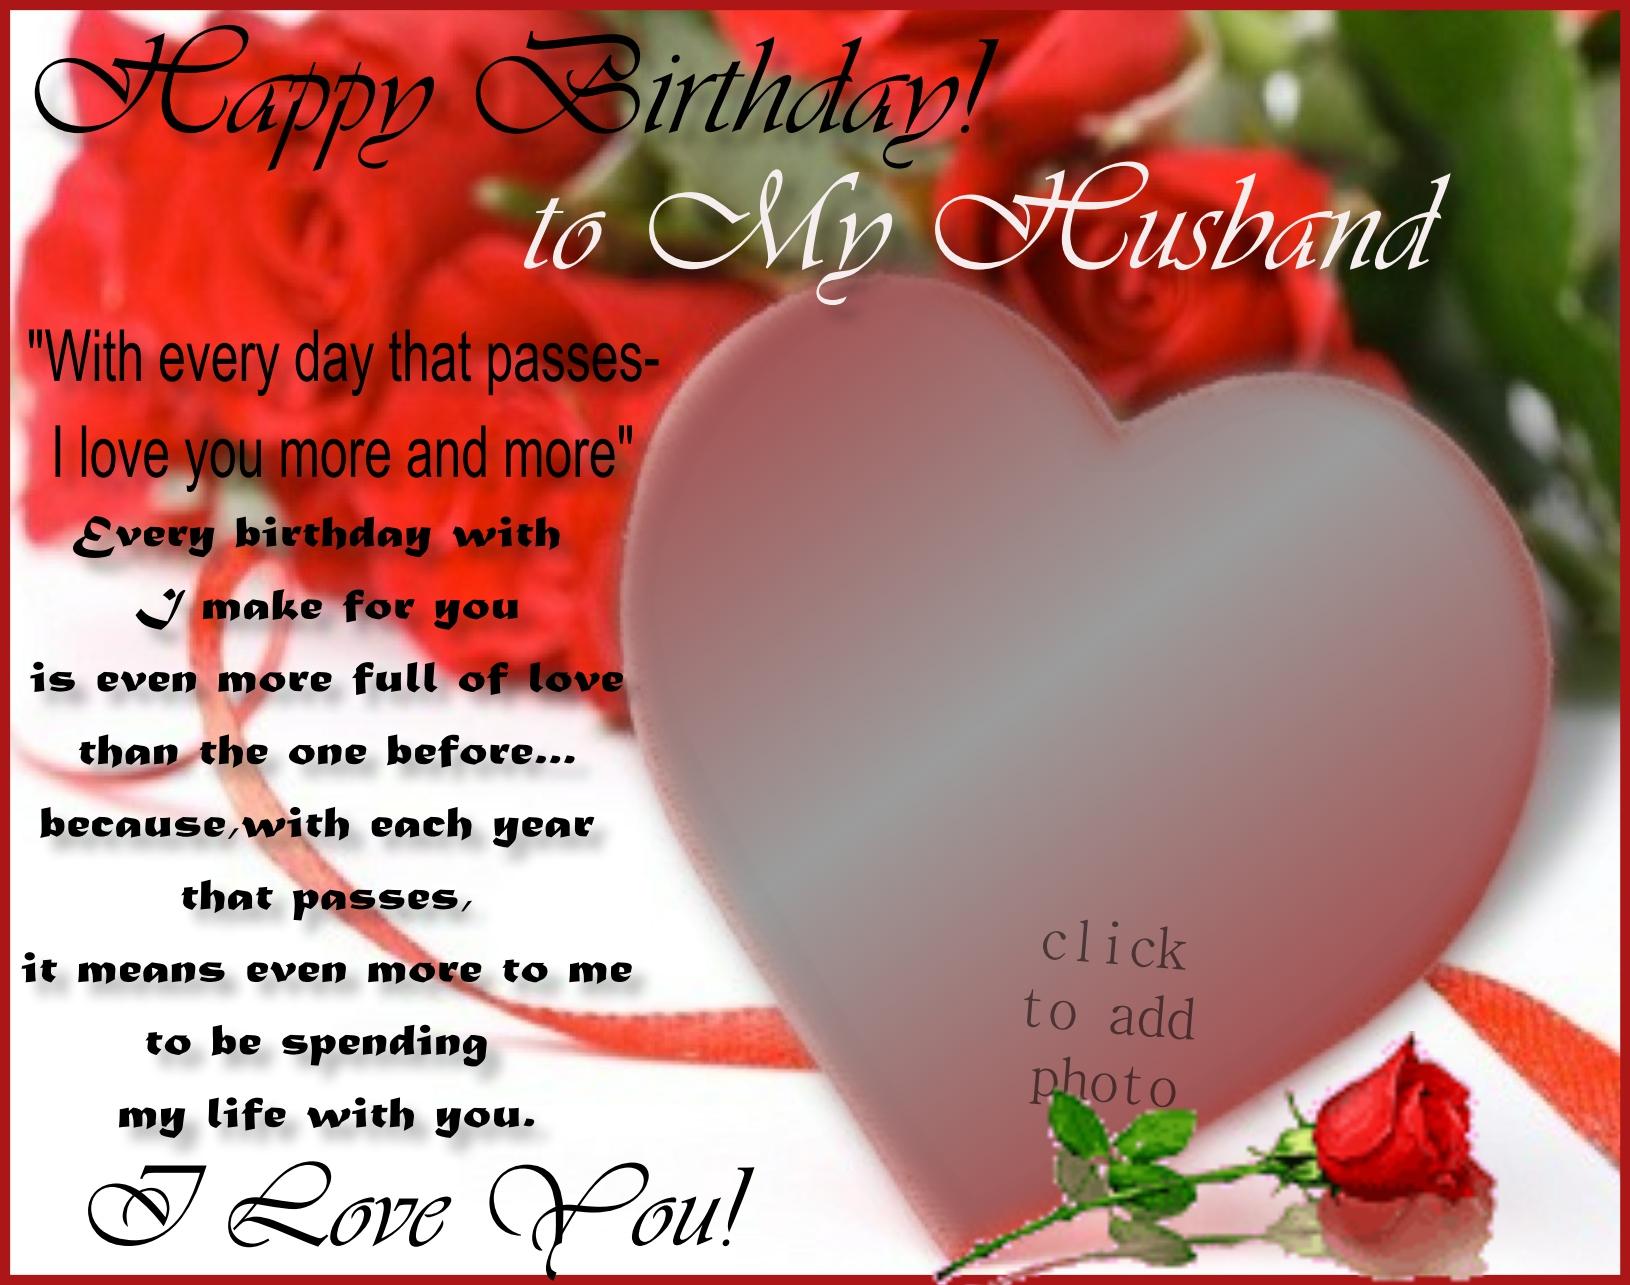 Imikimi Zo Birthday Frames Happy Birthday To My Husband Edit Husband To Wife Mardels13